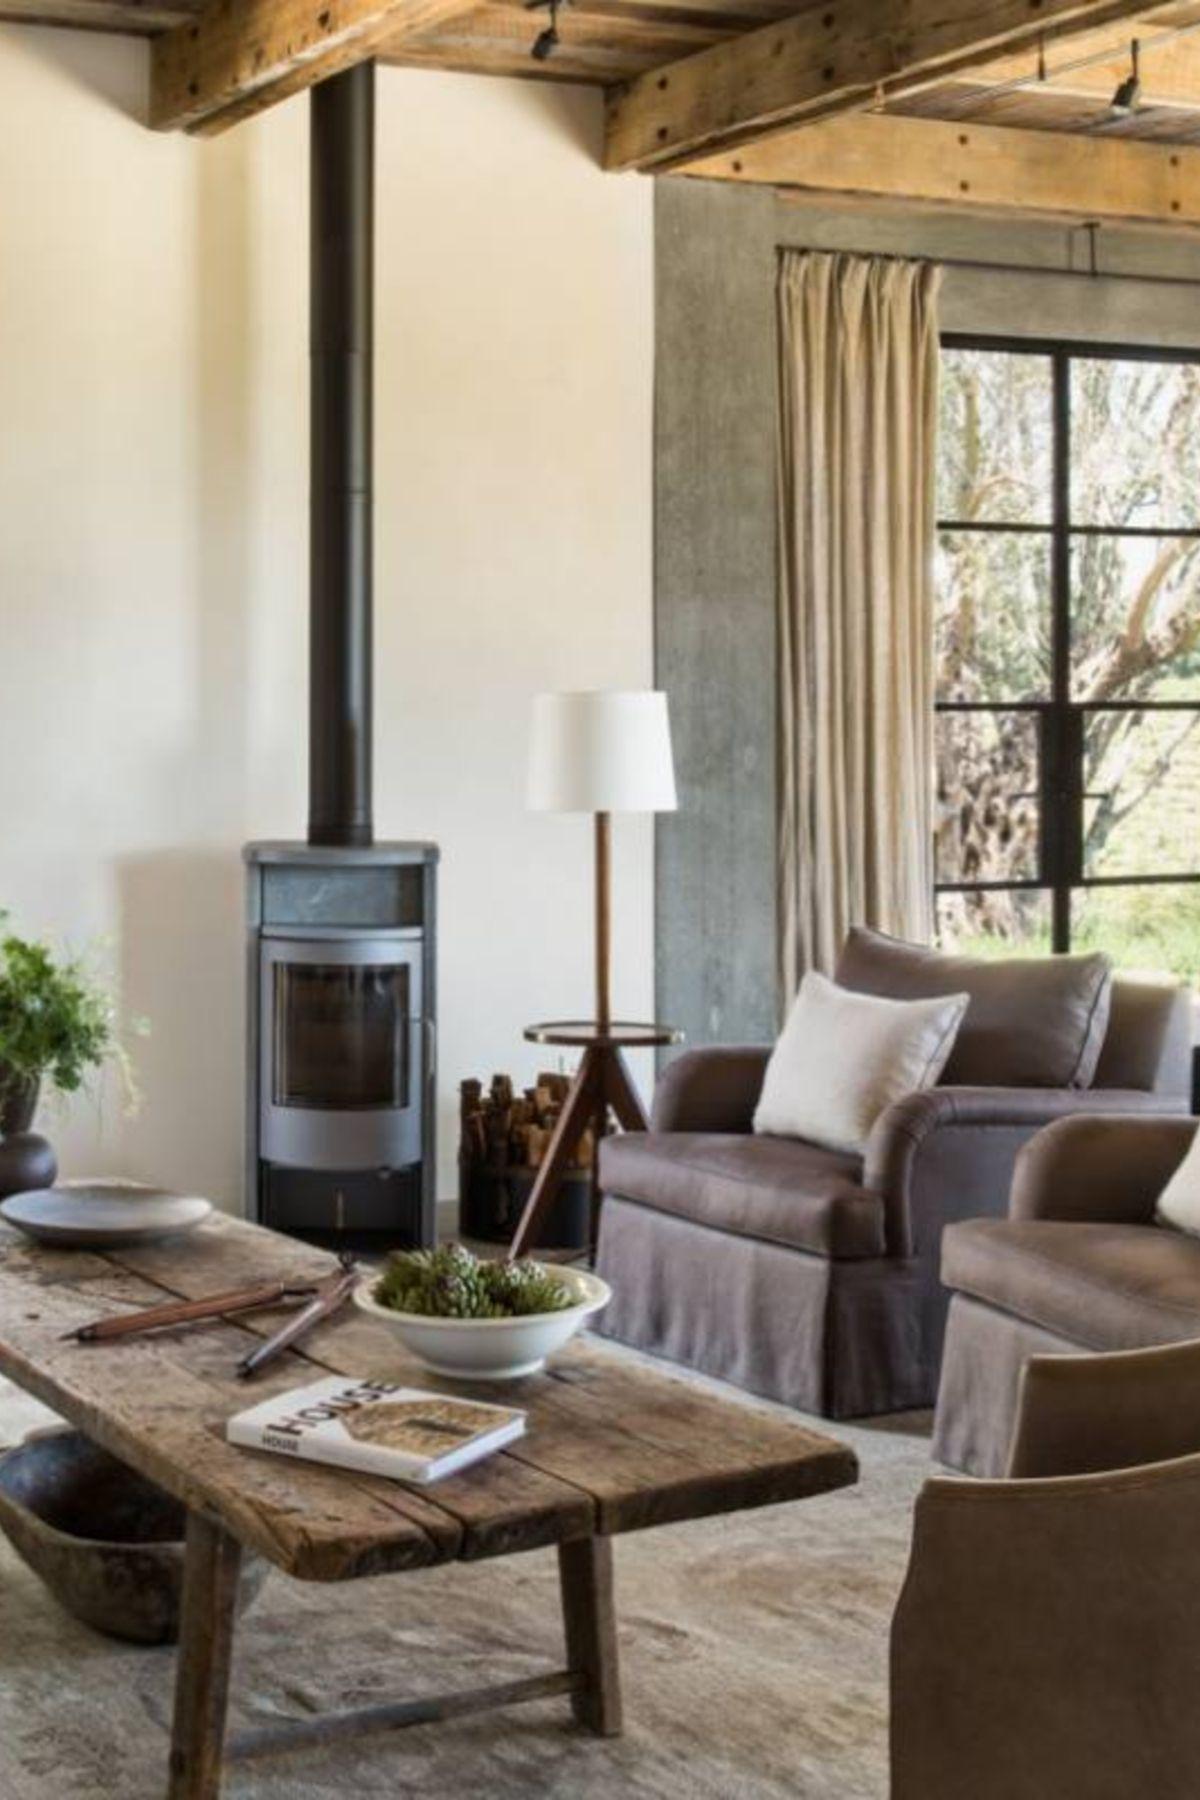 51+ Rustic Farmhouse Living Room Decor Ideas | Rustic ...